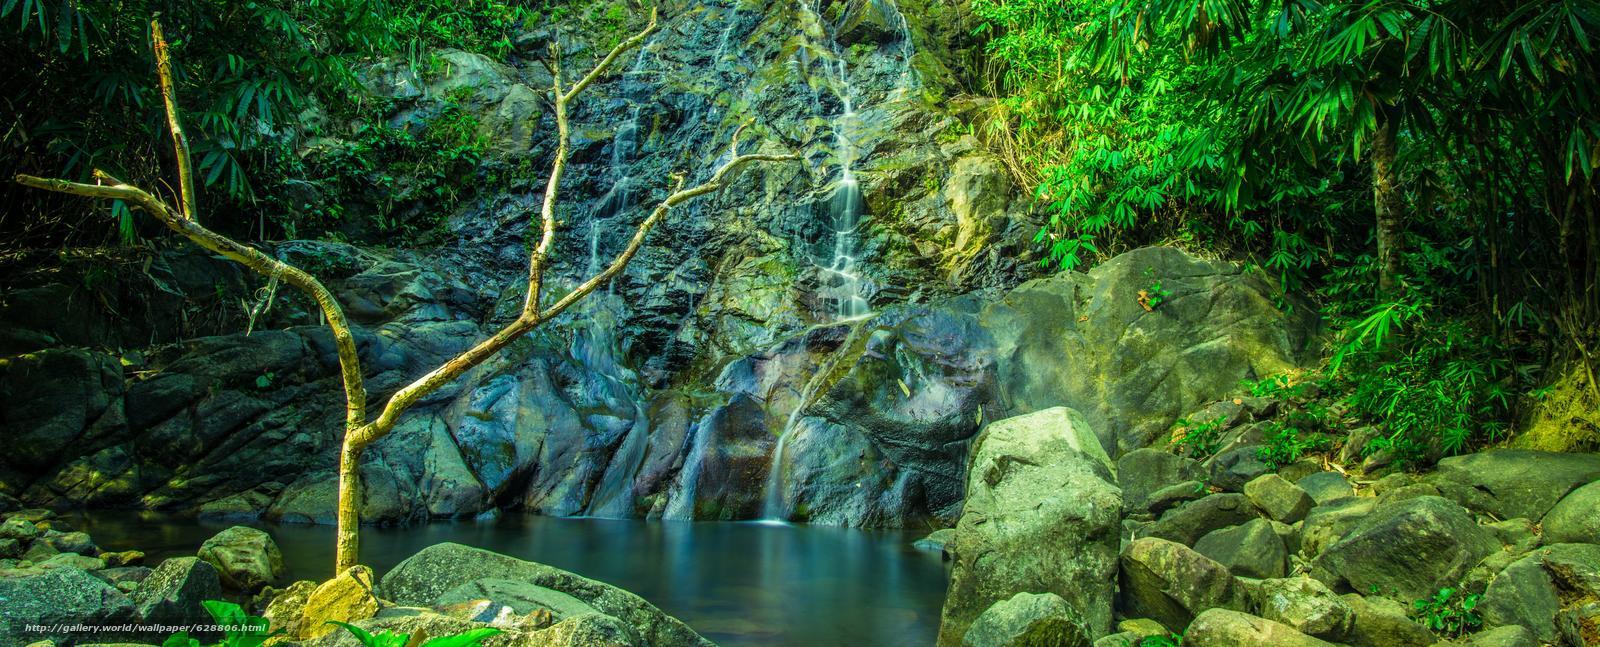 cachoeira, lagoa, pedras, ?rvores, Rochas, natureza